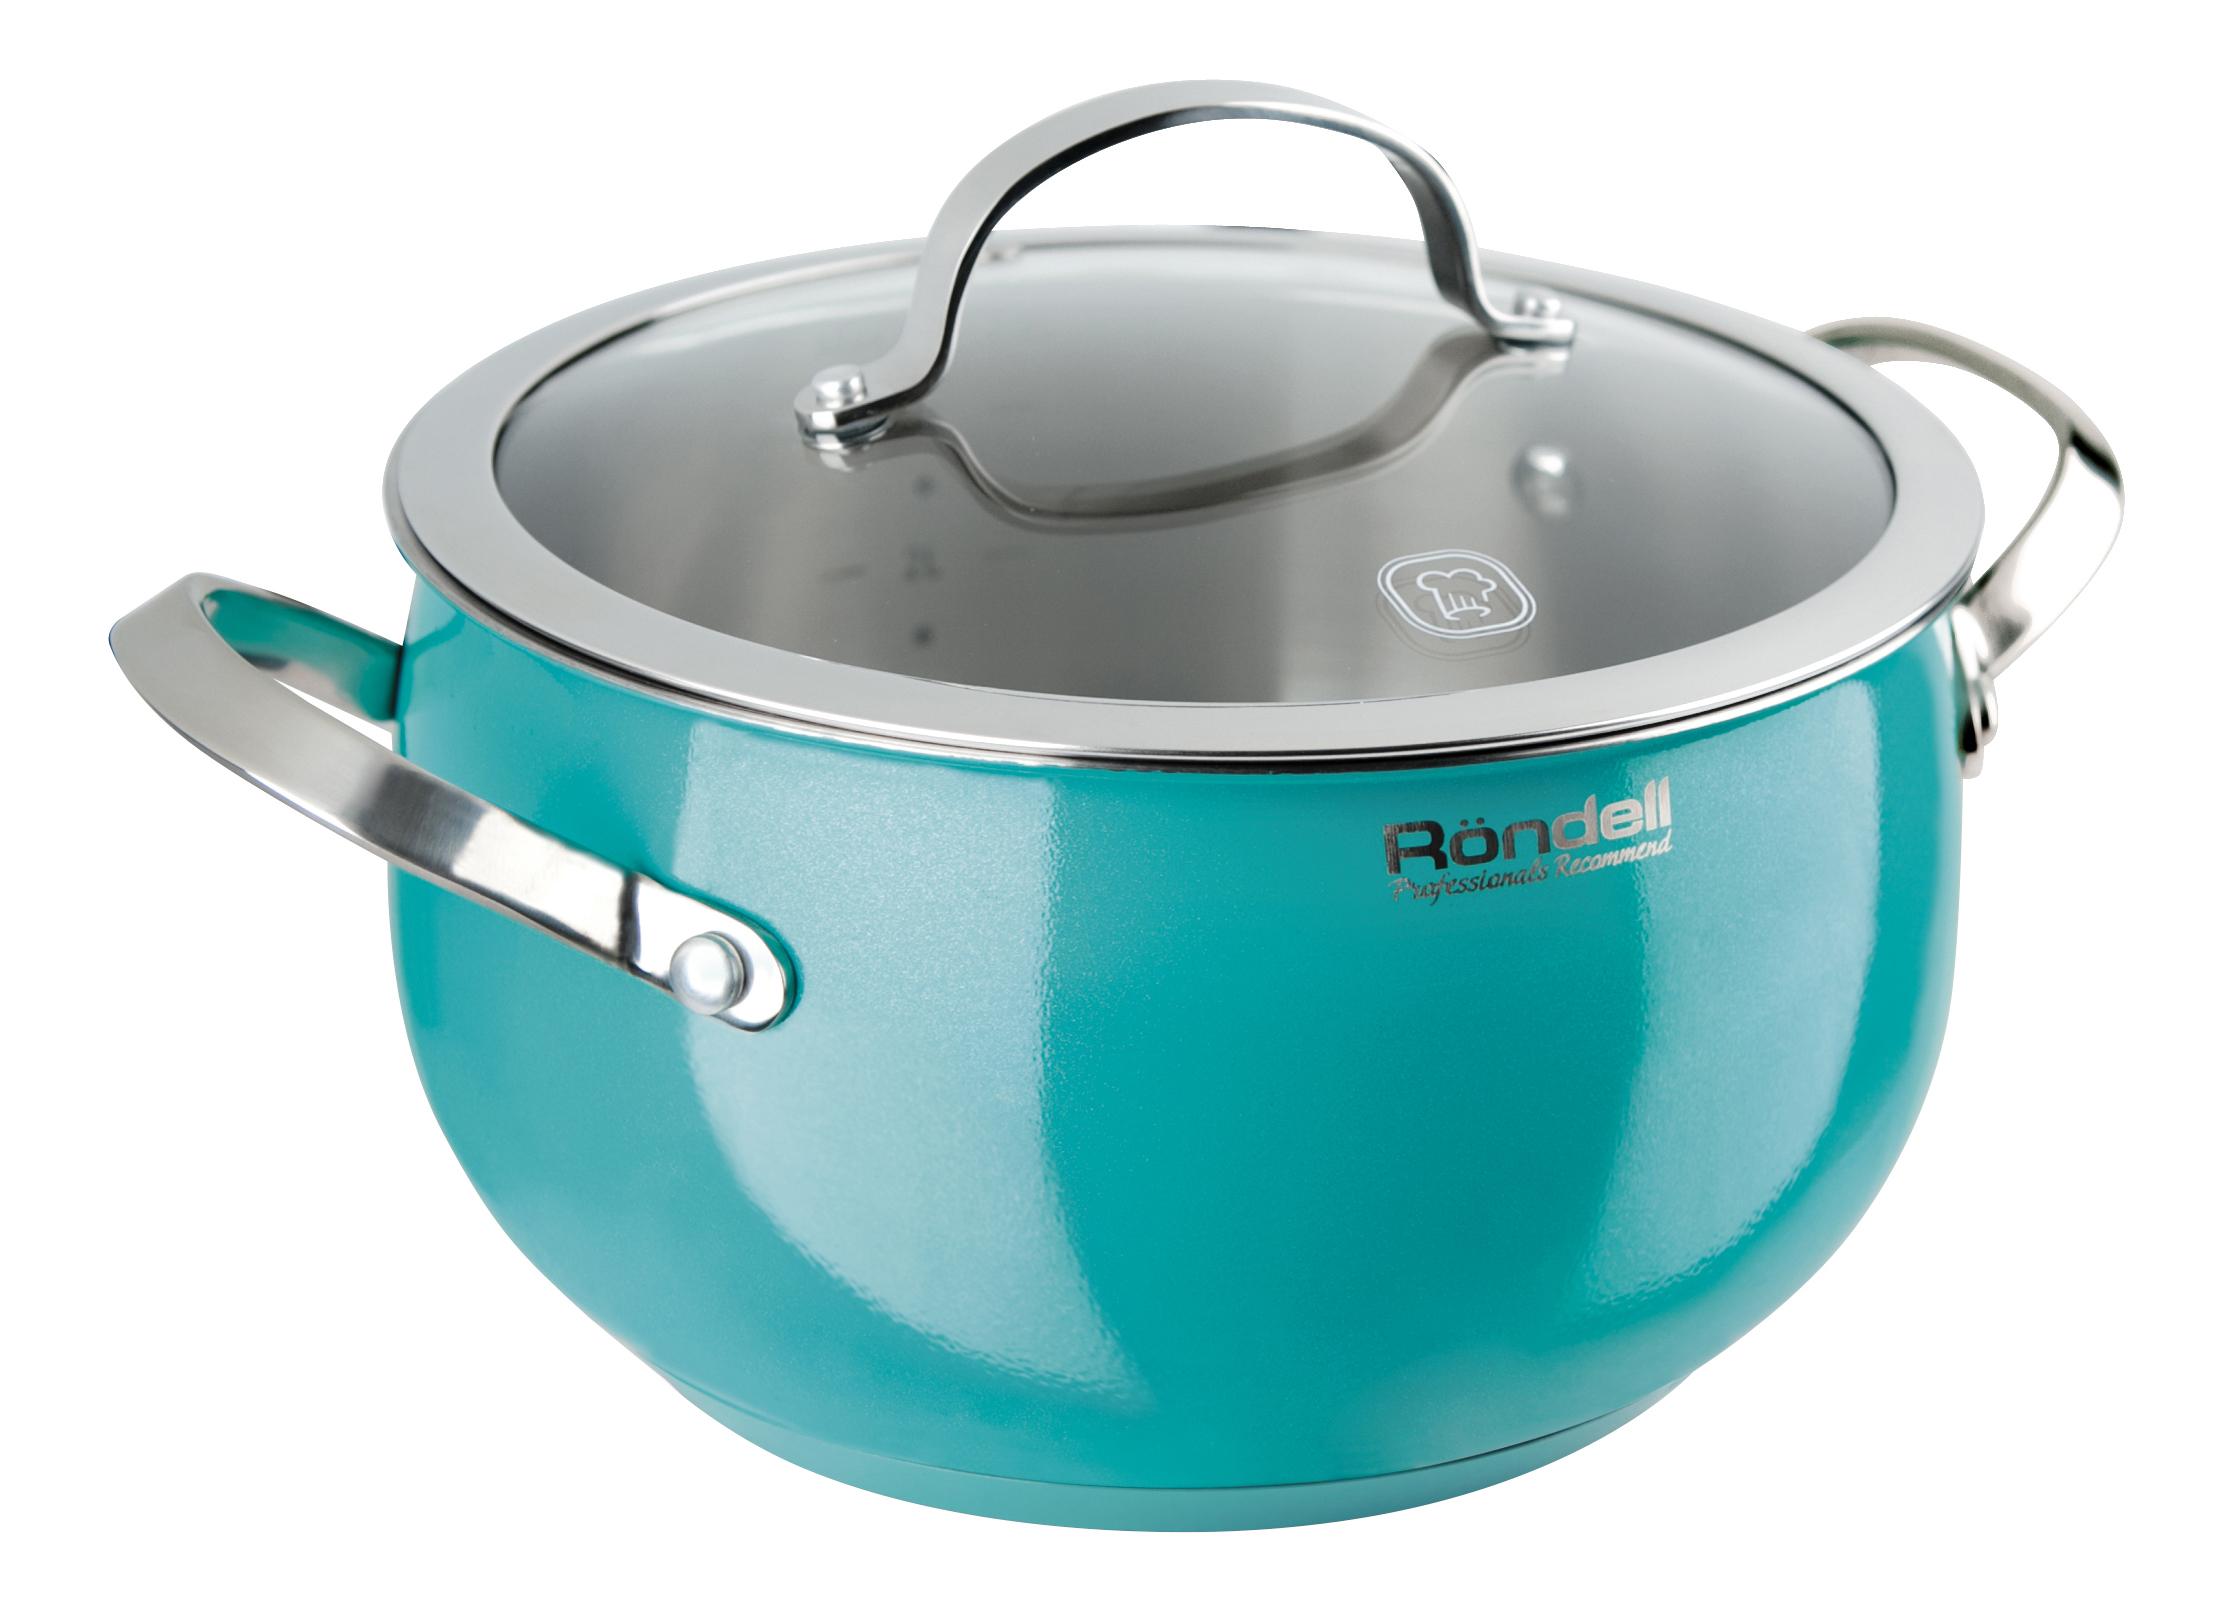 Кастрюля Röndell turquoise 2.8л